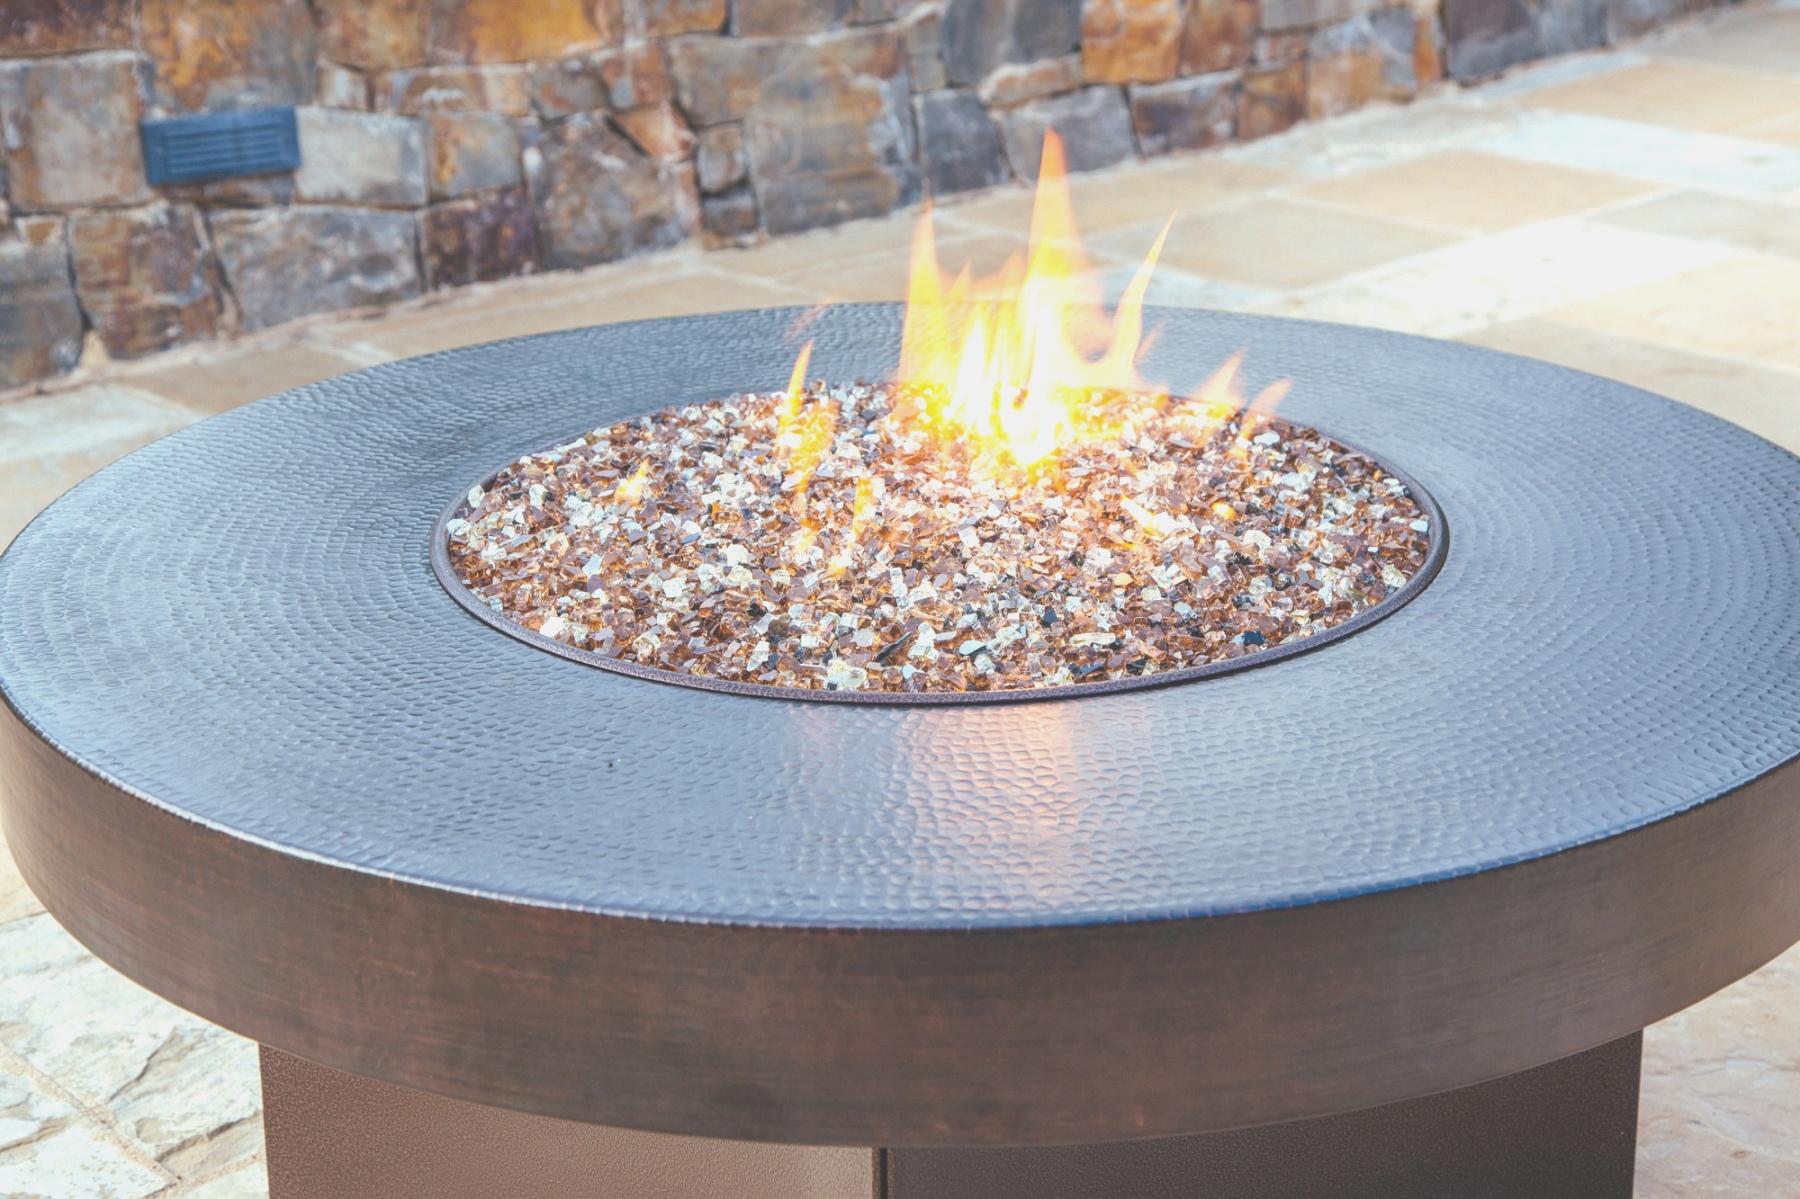 fire pit glass | Diy Fire Pit Glass Rocks Tropical Daze Diy Glass Fire Pit | Ship ..